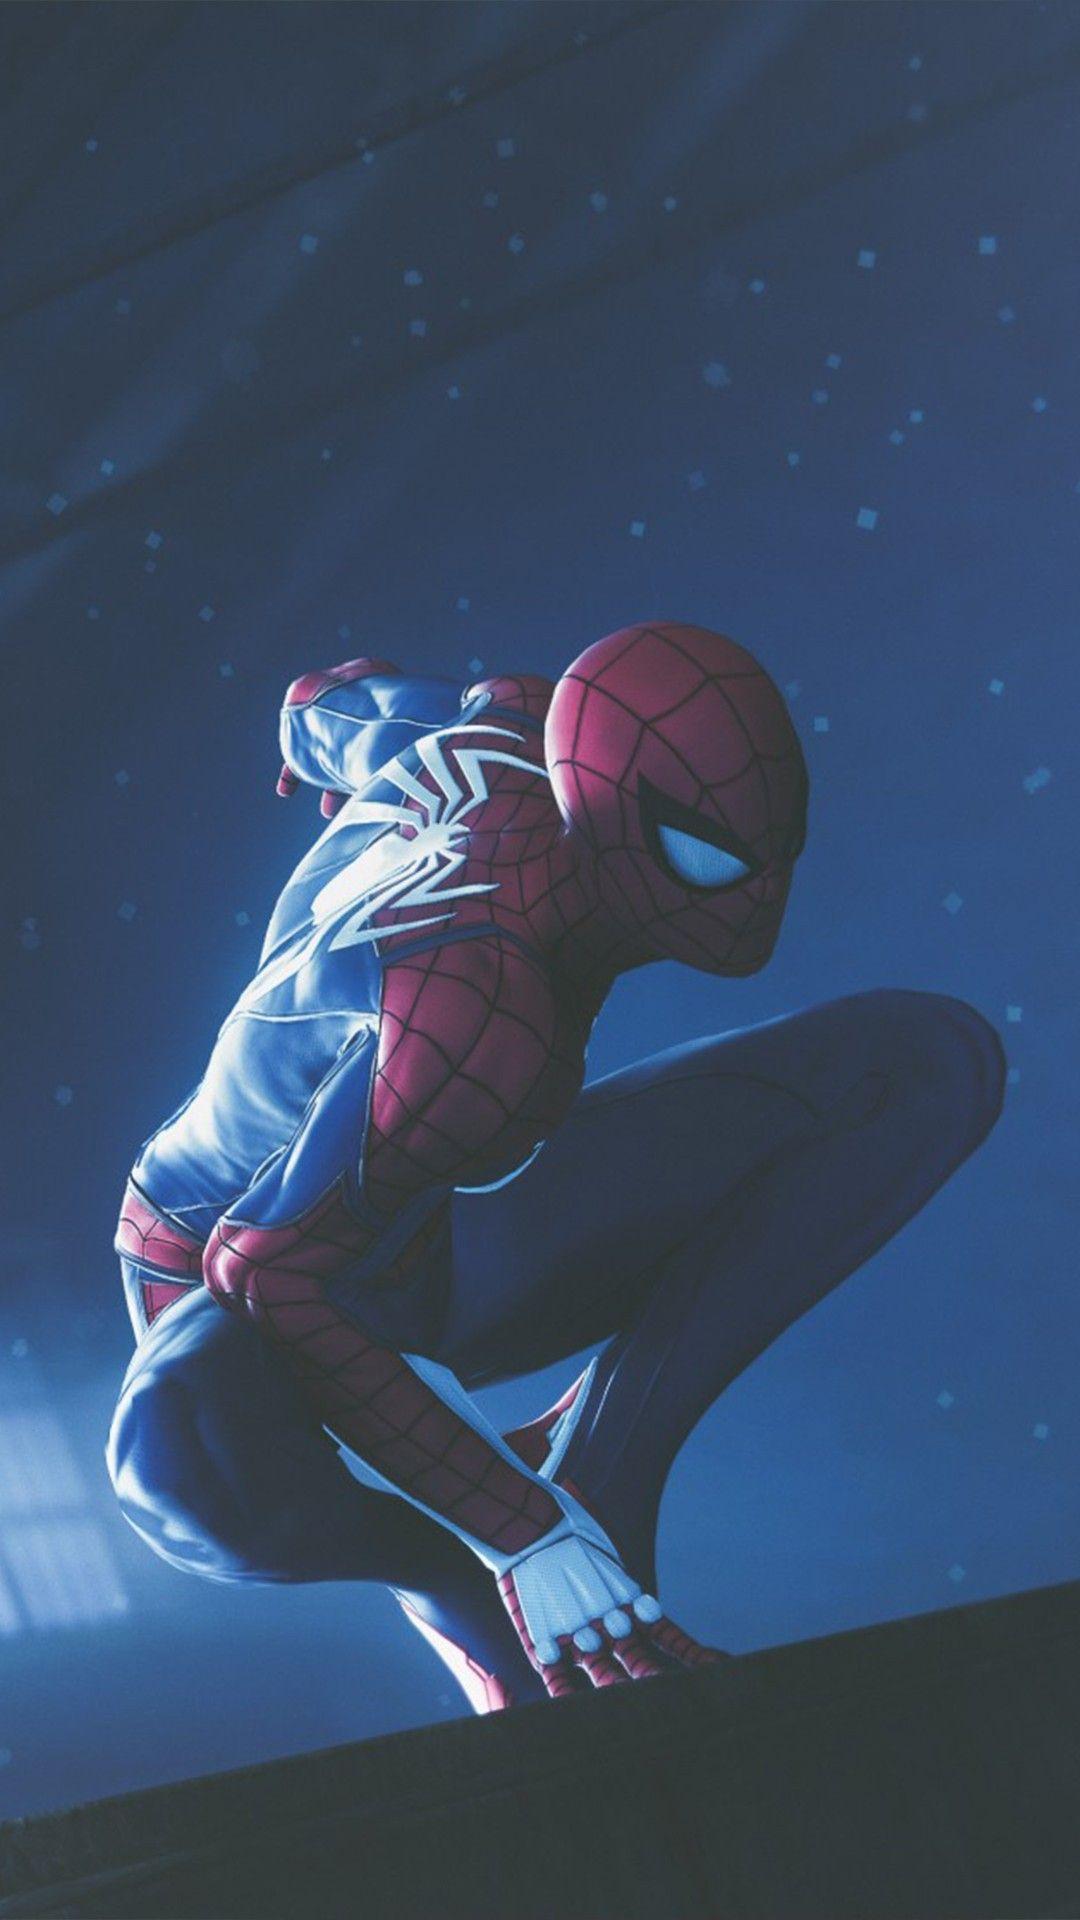 Marvels Spider Man Ps4 Spiderman Marvel Spiderman Amazing Spiderman